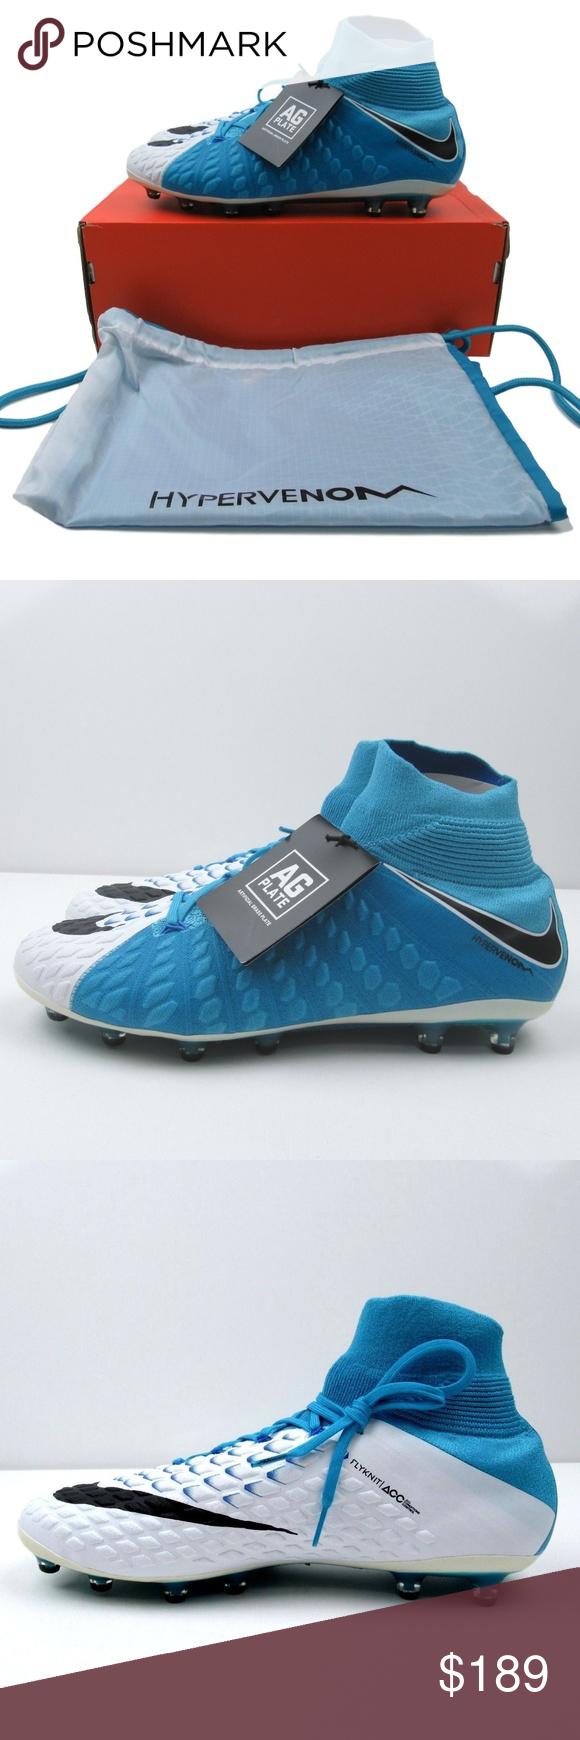 a058b33596f4 Nike Hypervenom Phantom 3 AGPro 11.5 Soccer Cleats Nike Hypervenom Phantom  III DF AG-Pro Soccer Cleats Style - 852550-104 Men s Size 11.5 Brand NEW in  ...